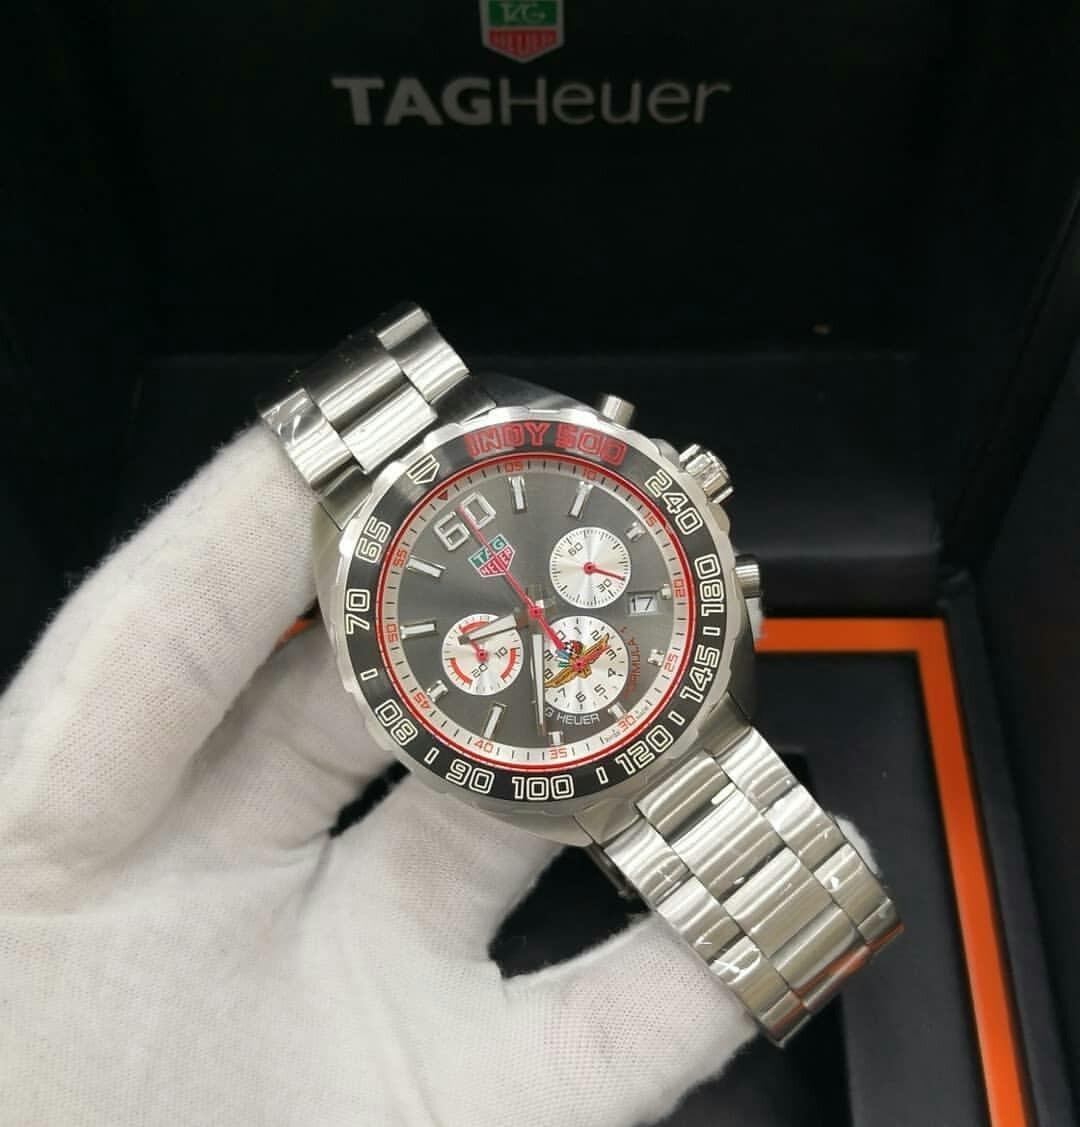 3b9188b1d24 relógio tag heuer indy 500 importado linha premium aaa luxo. Carregando  zoom.